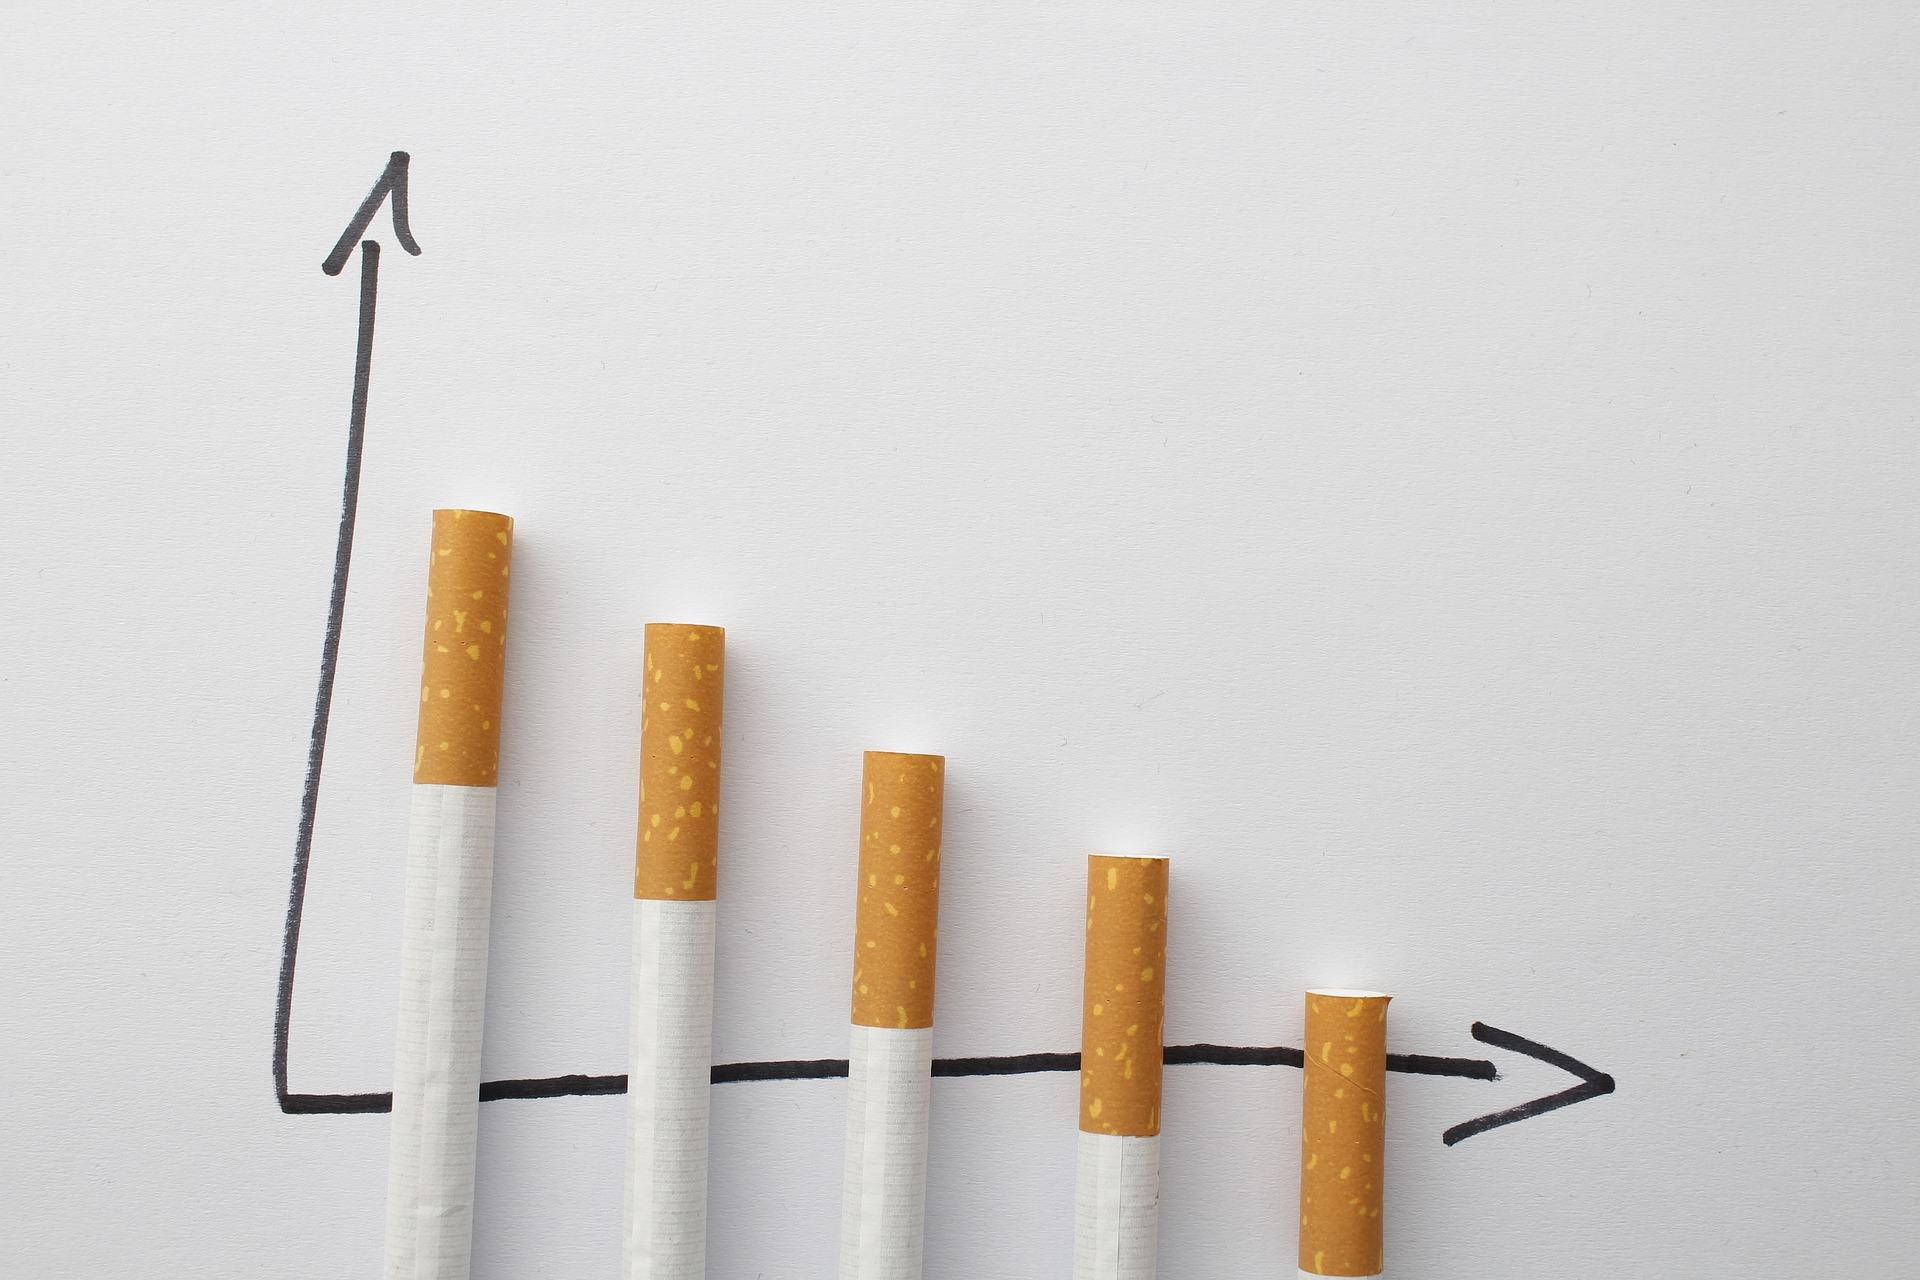 cigarettes-2142848_1920.jpg